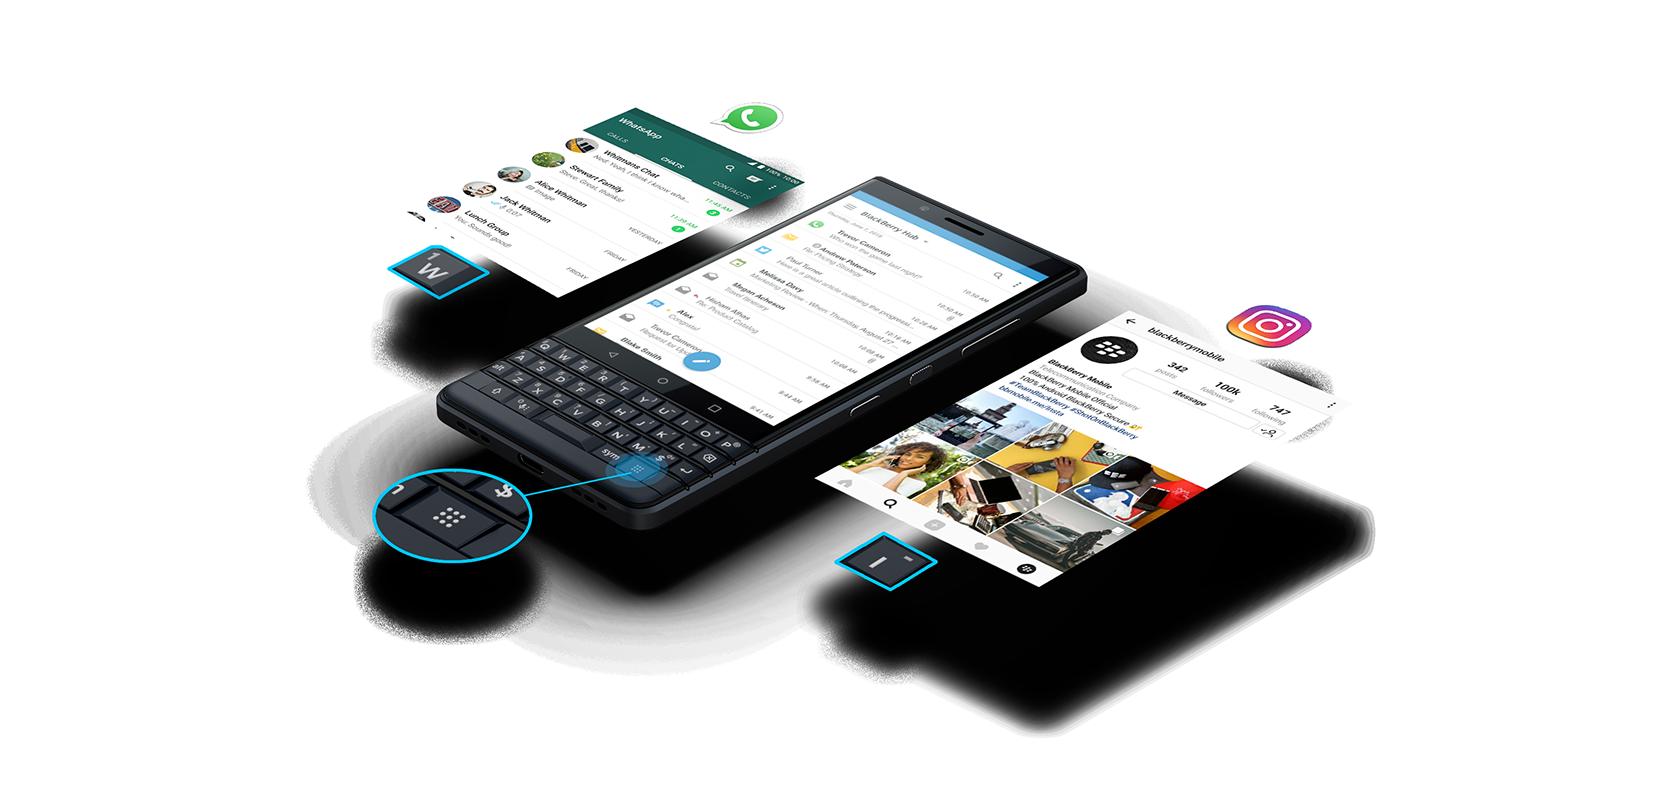 effortless efficiency transparent - BlackBerry KEY 2 LE